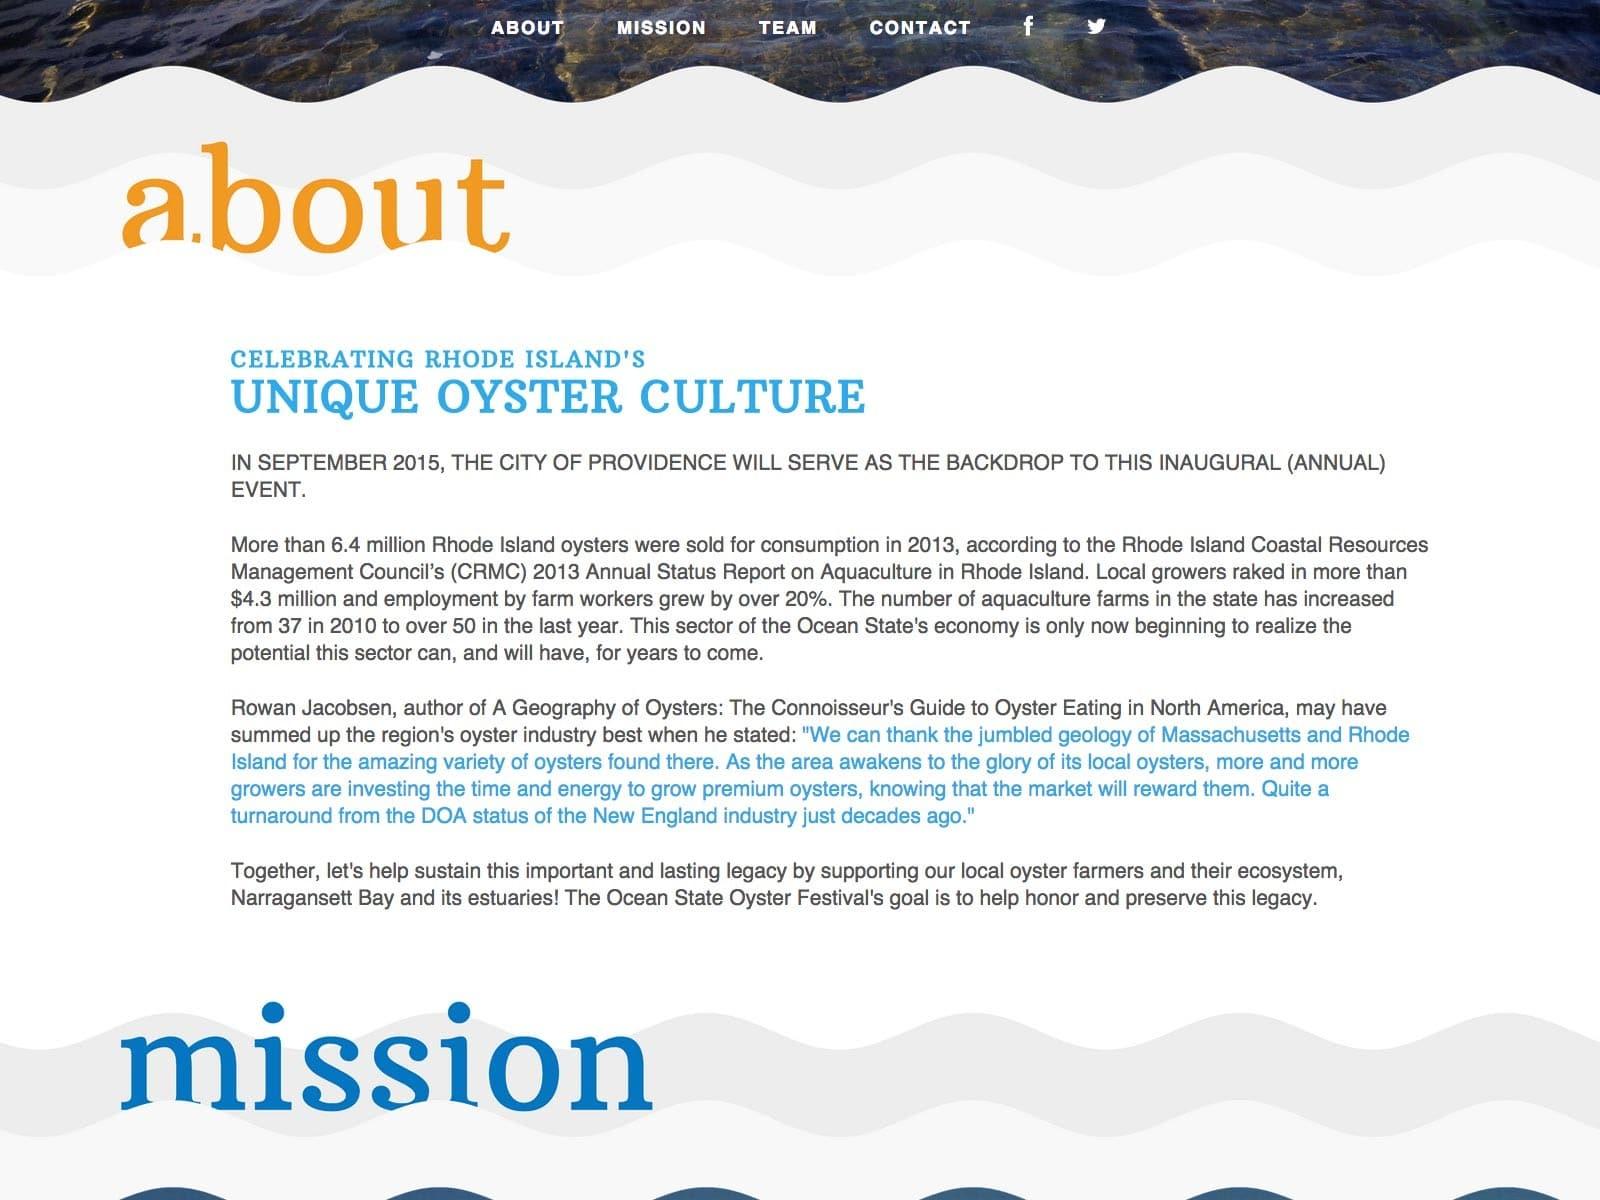 ocean-state-oyster-festival-screenshot-2